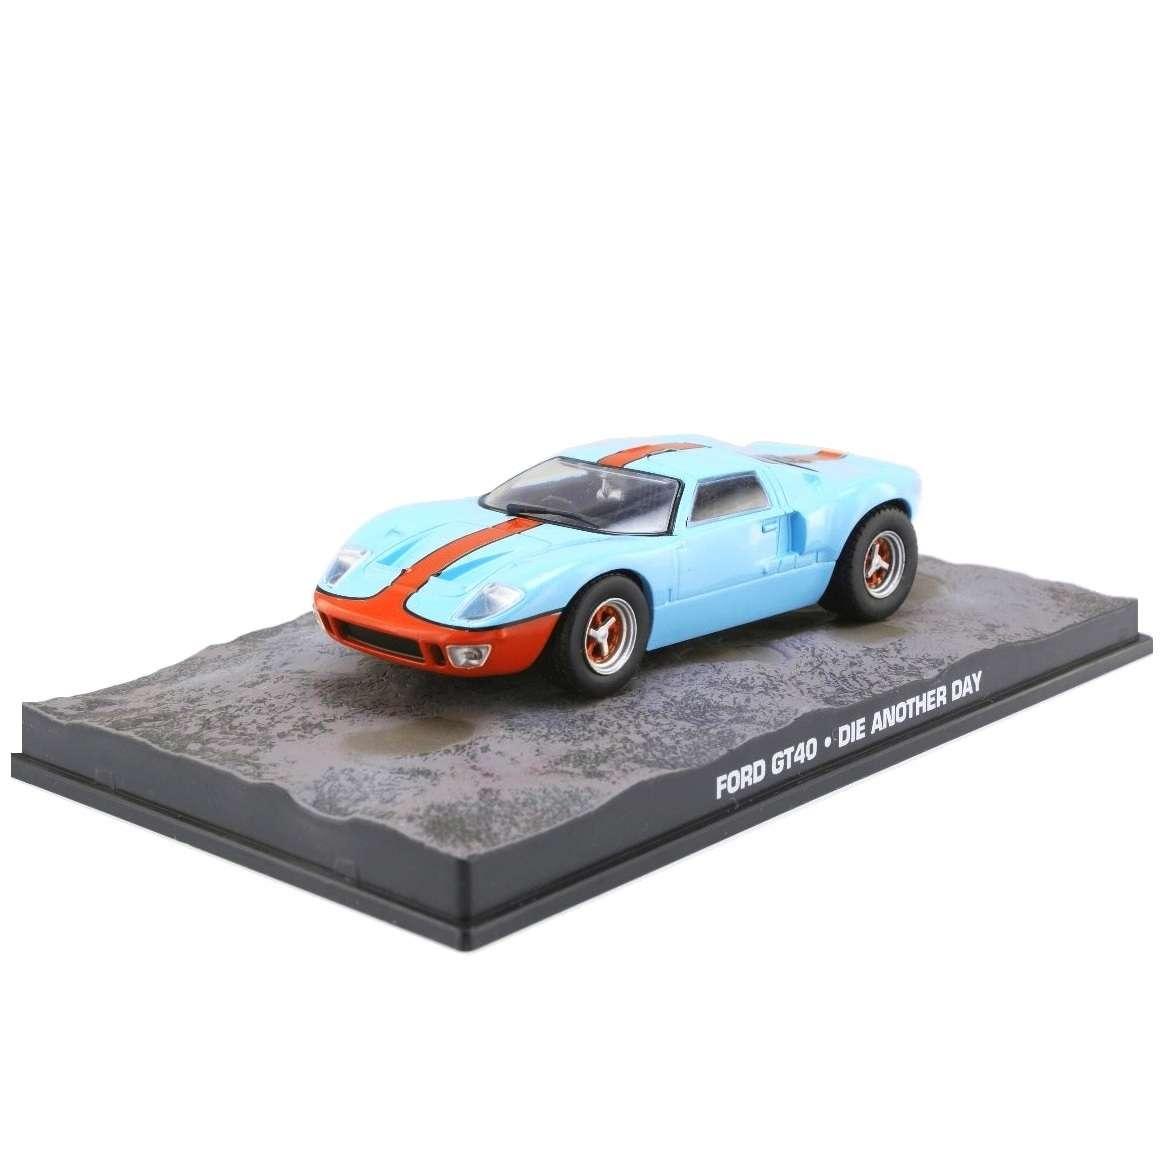 Diecast Car 1/43: James Bond - Ford GT40 Photo